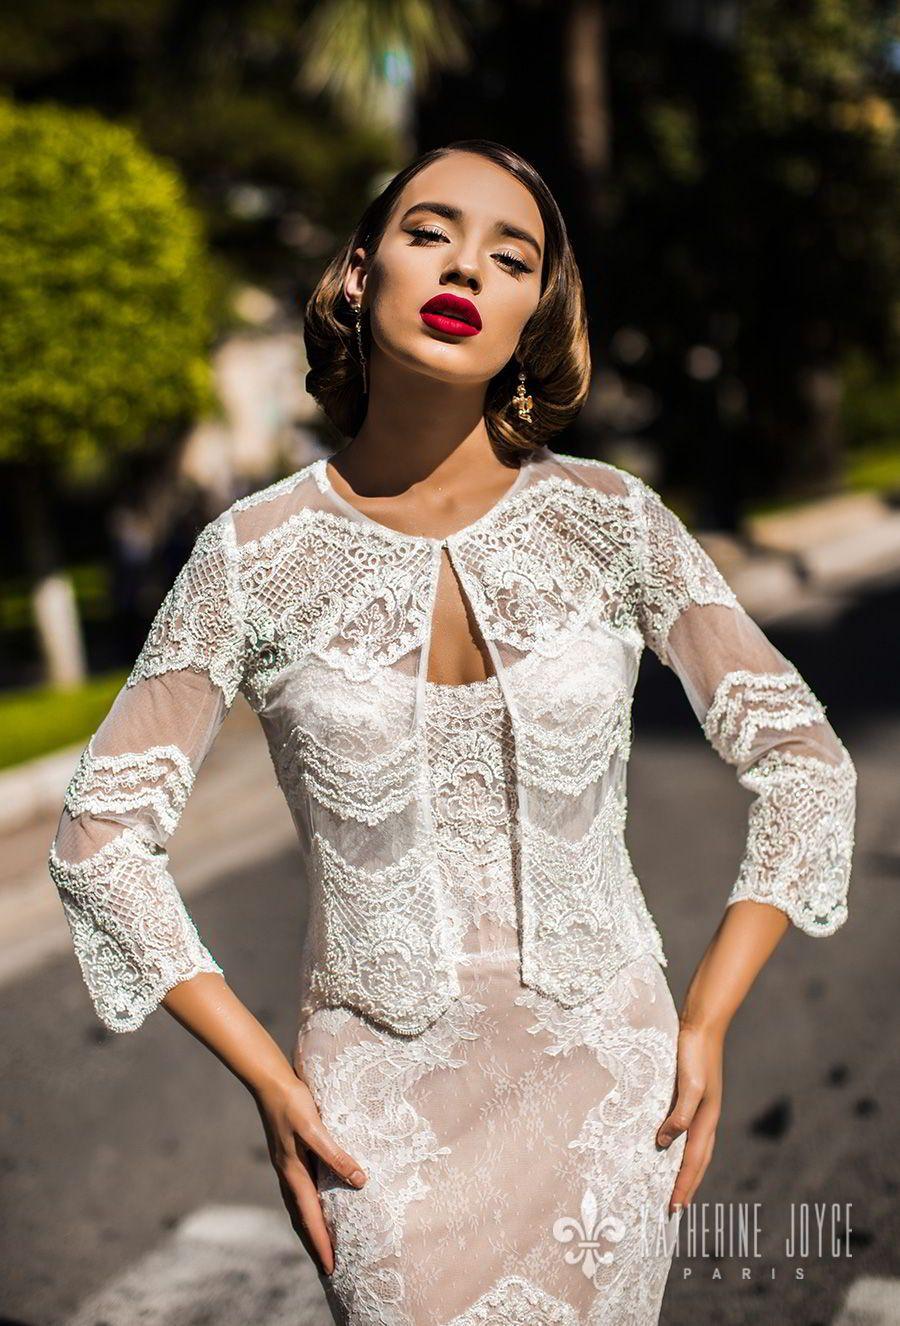 Lace wedding dress with cap sleeves sweetheart neckline  Katherine Joyce  Wedding Dresses u ucMa Cherieud Bridal Collection